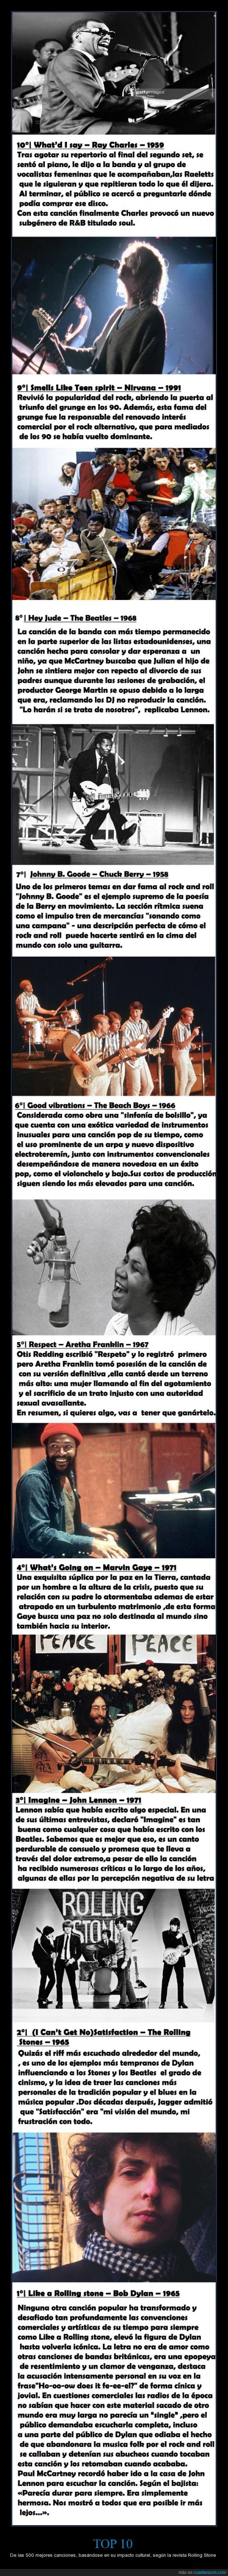 Aretha Franklin,Bob Dylan,Chuck Berry,John Lennon,Marvin Gaye,Nirvana,Ray Charles,The Beach Boys,The Beatles,The Rolling Stones